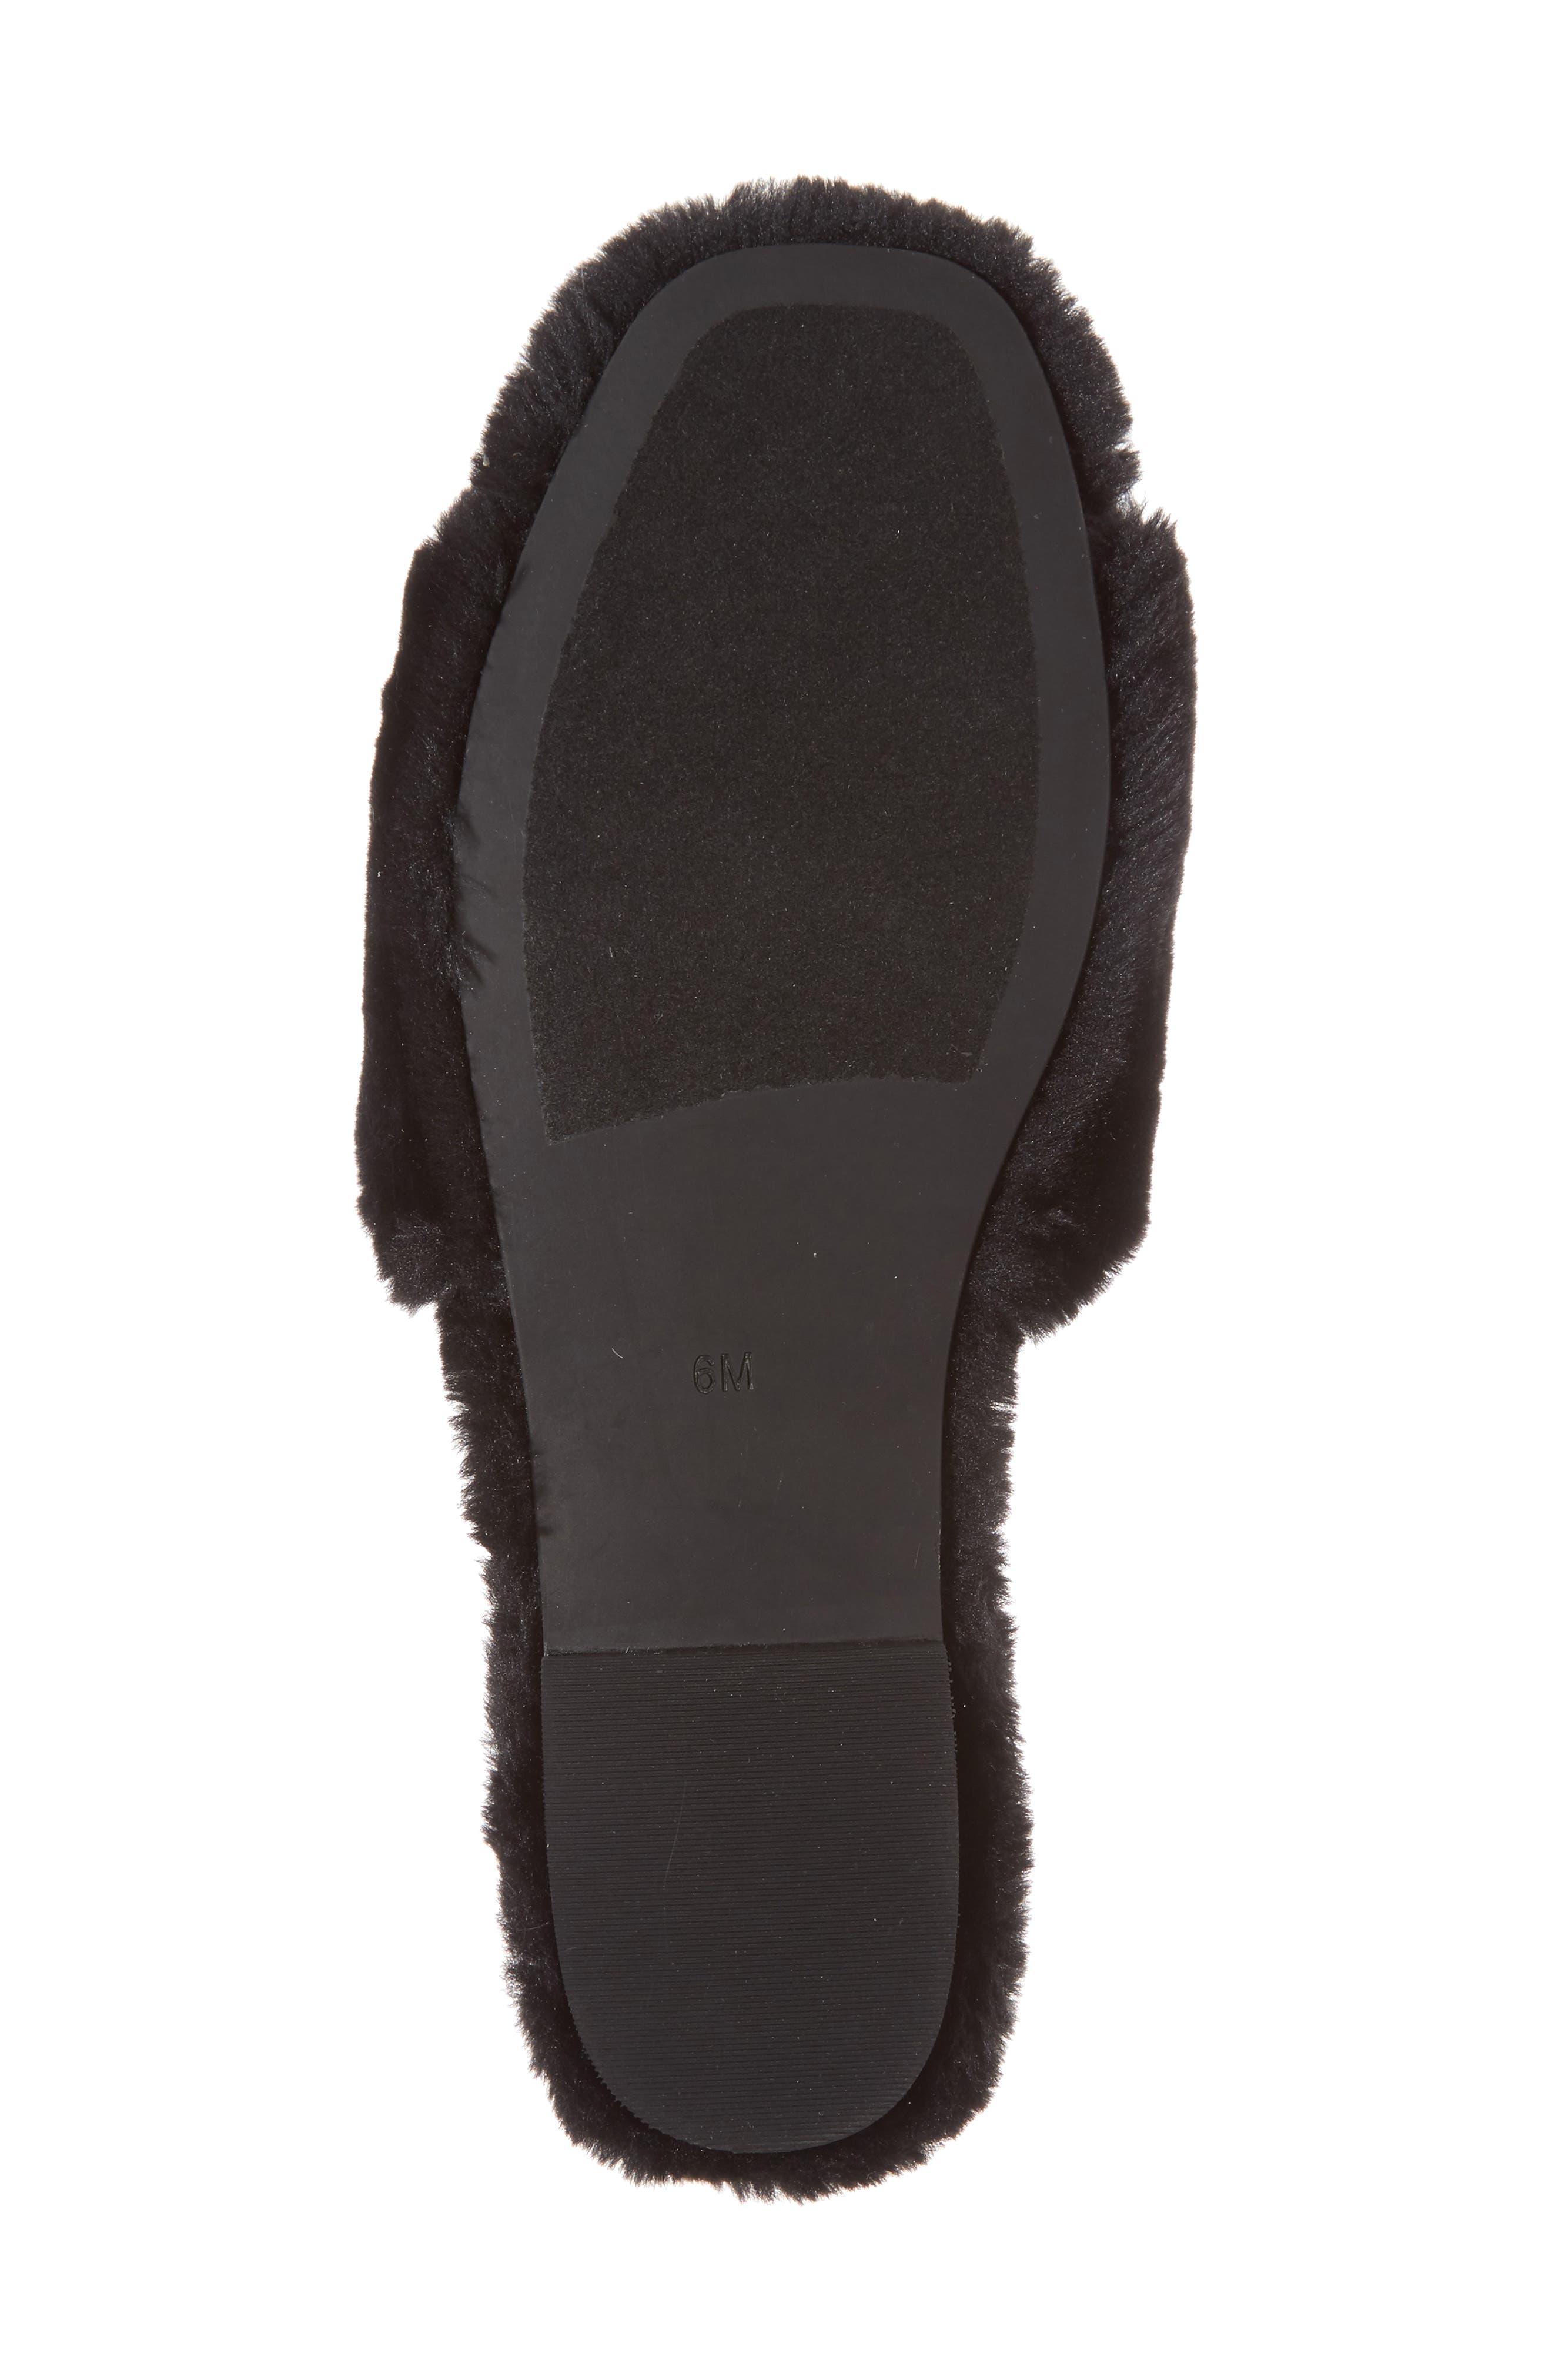 Motel-F Faux Fur Slide Sandal,                             Alternate thumbnail 16, color,